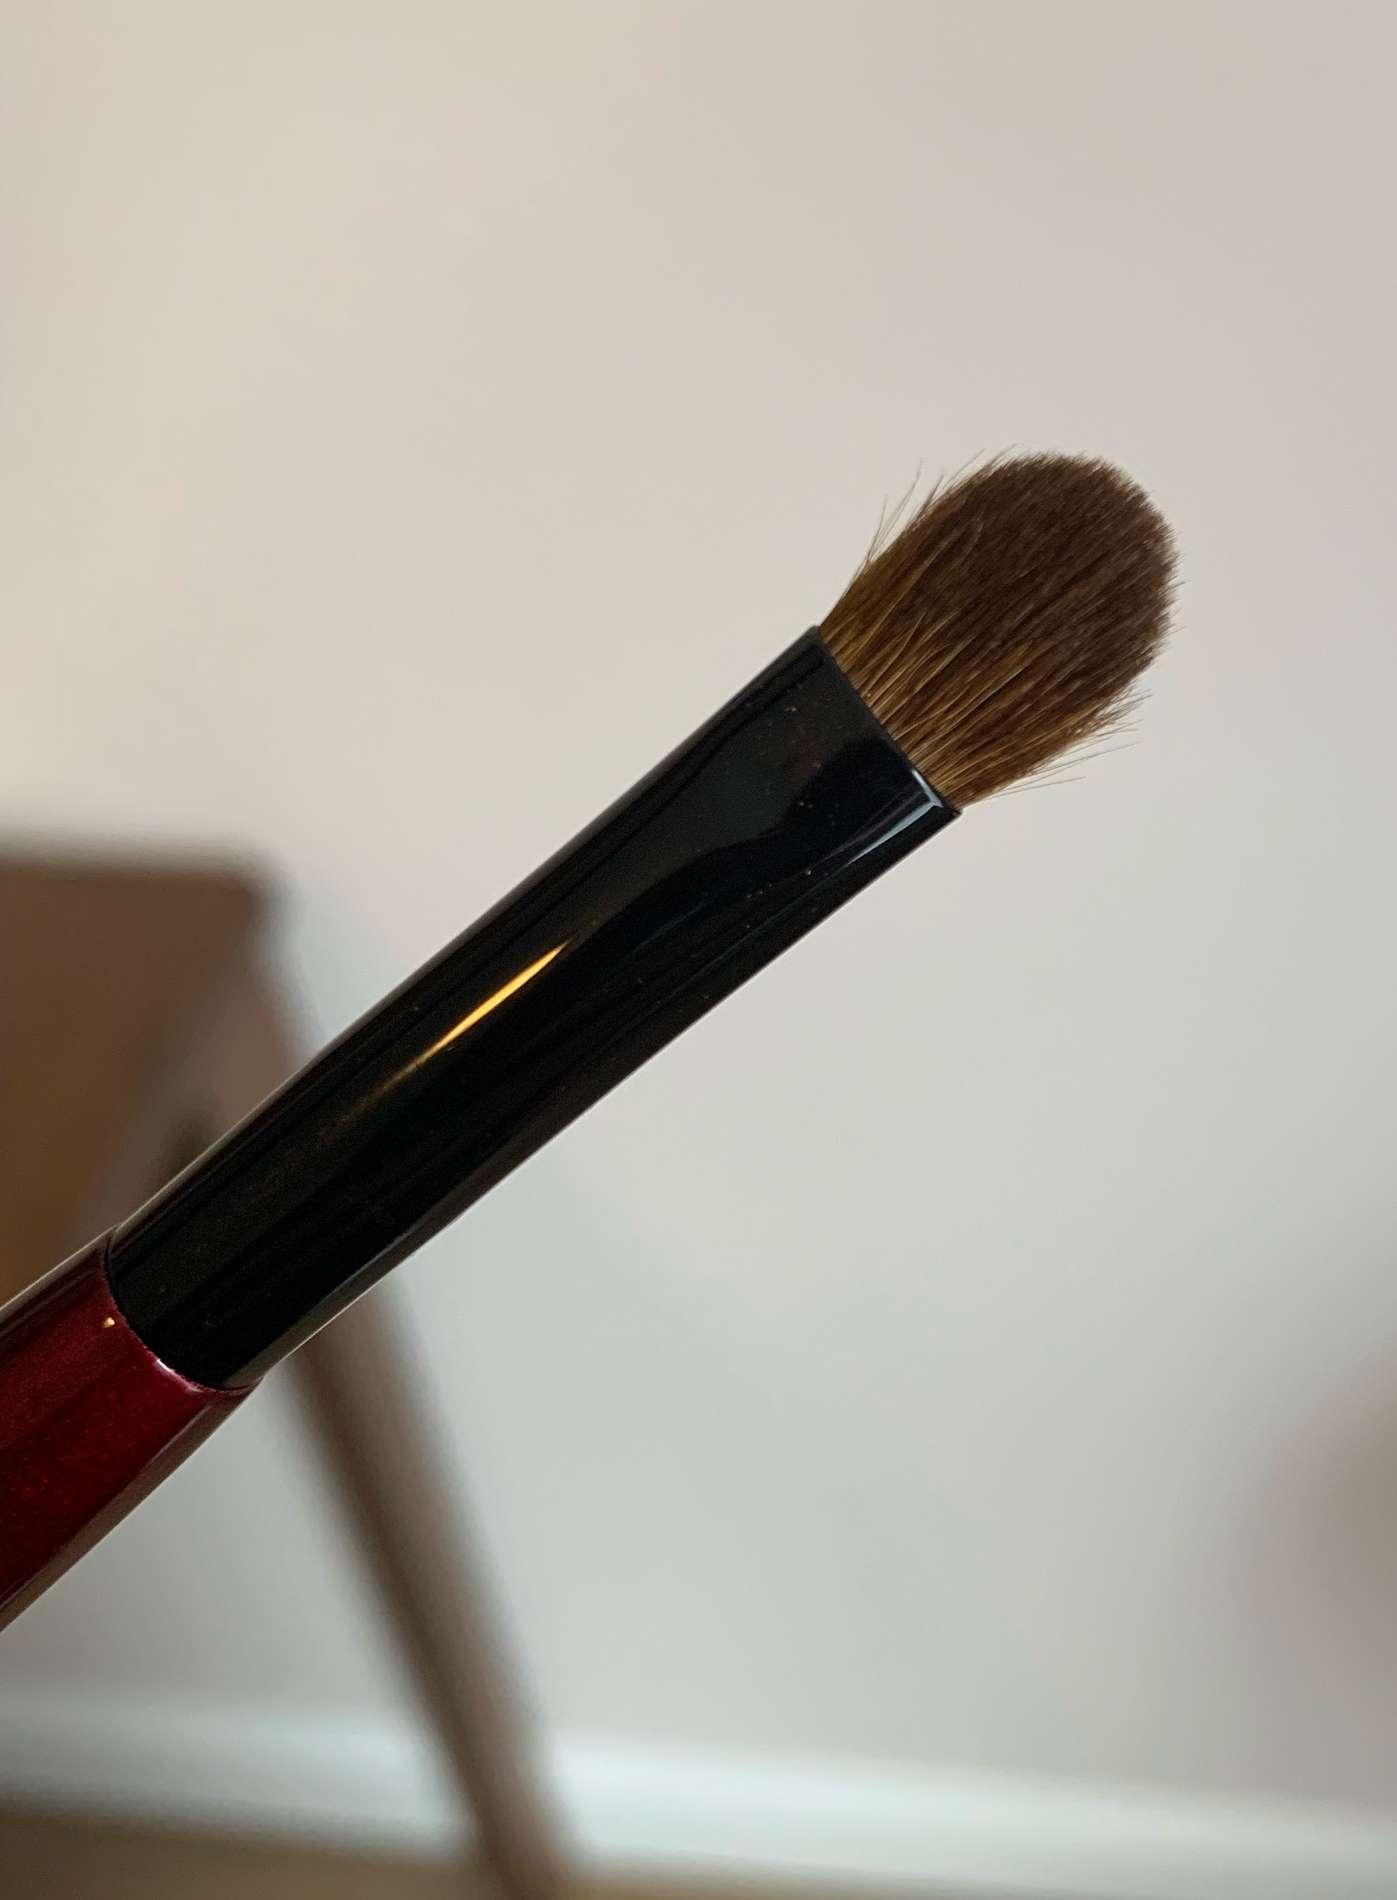 Sonia G Builder Pro Brush Review